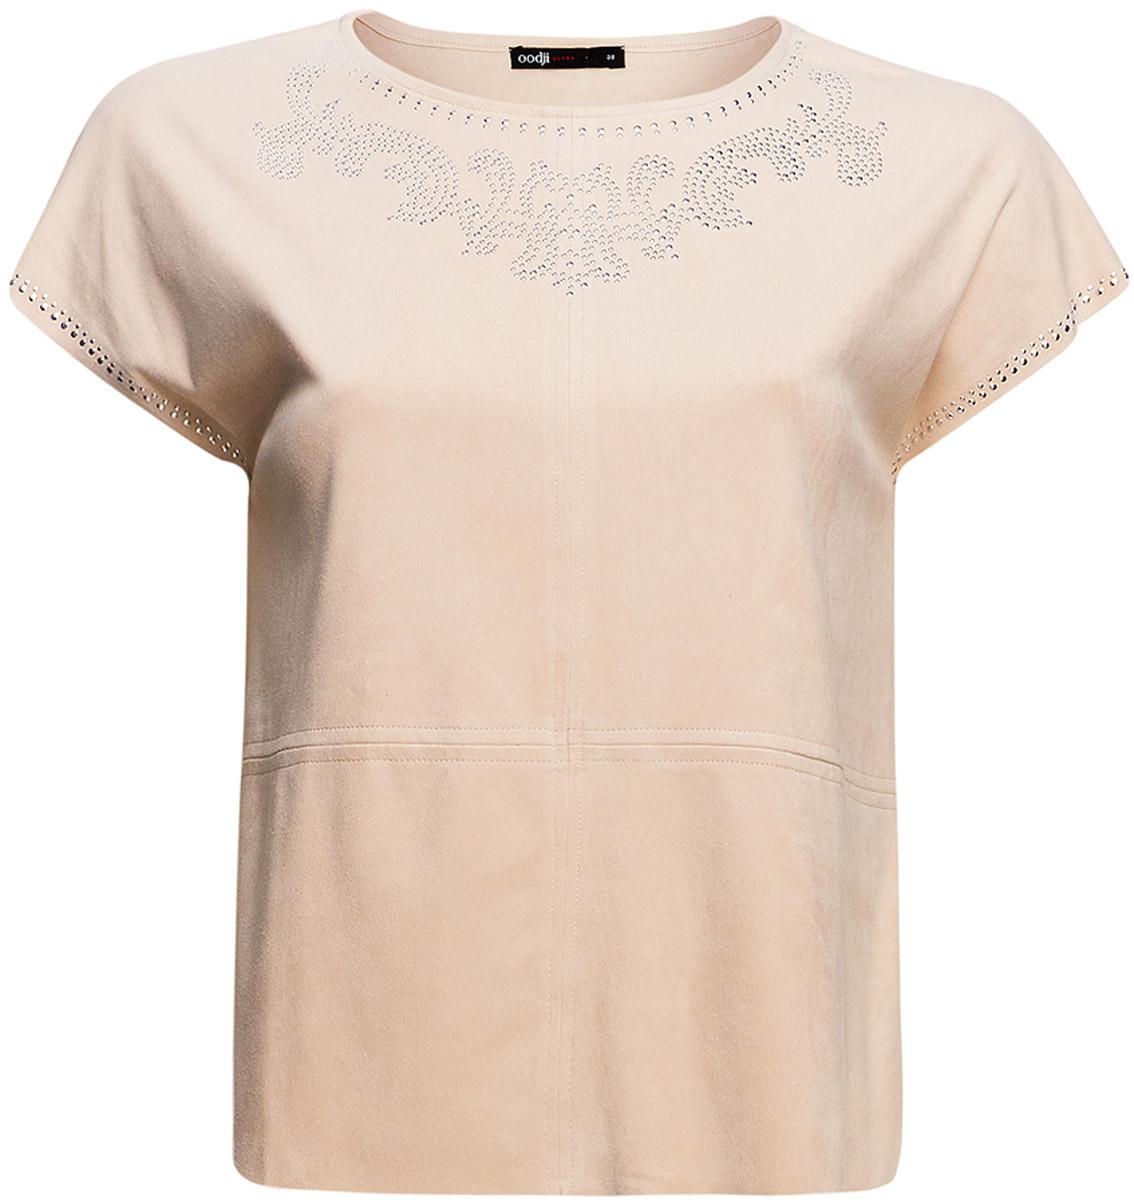 Блузка женская oodji Ultra, цвет: бежевый. 11411115/45622/3300N. Размер 34-170 (40-170) пуловеры oodji пуловер